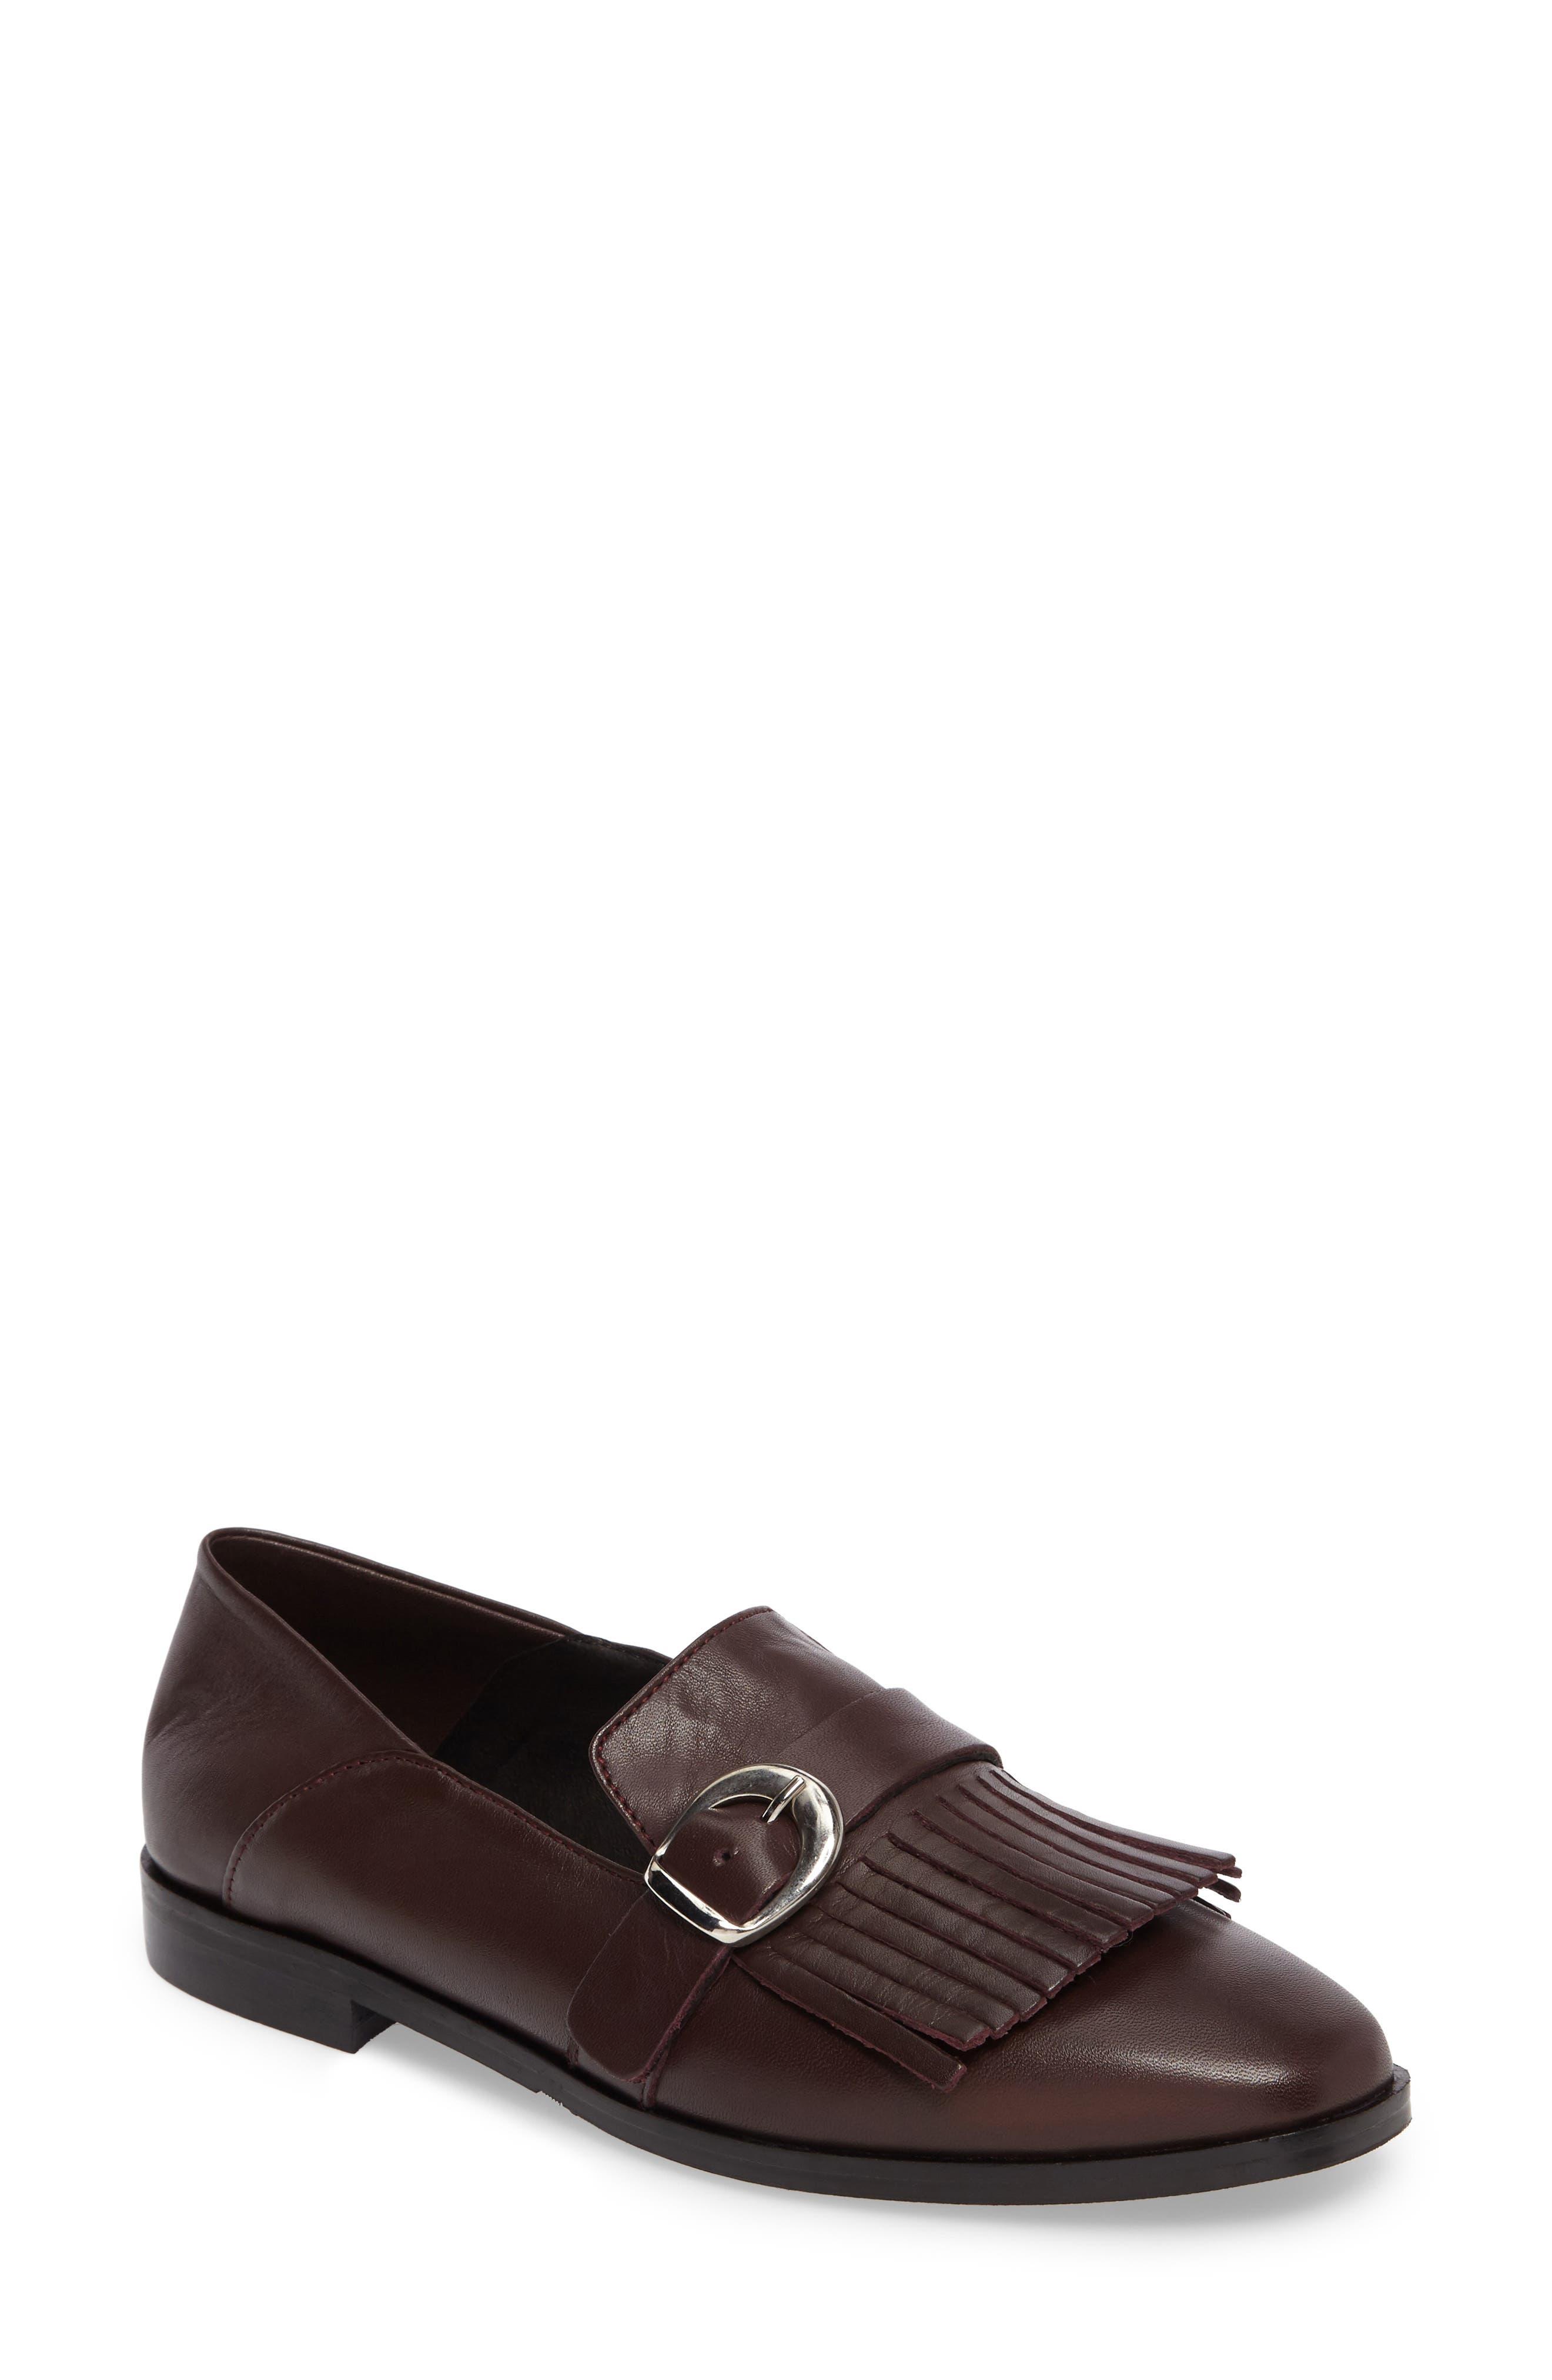 Dame Fringed Loafer Flat,                         Main,                         color, Burgundy Leather